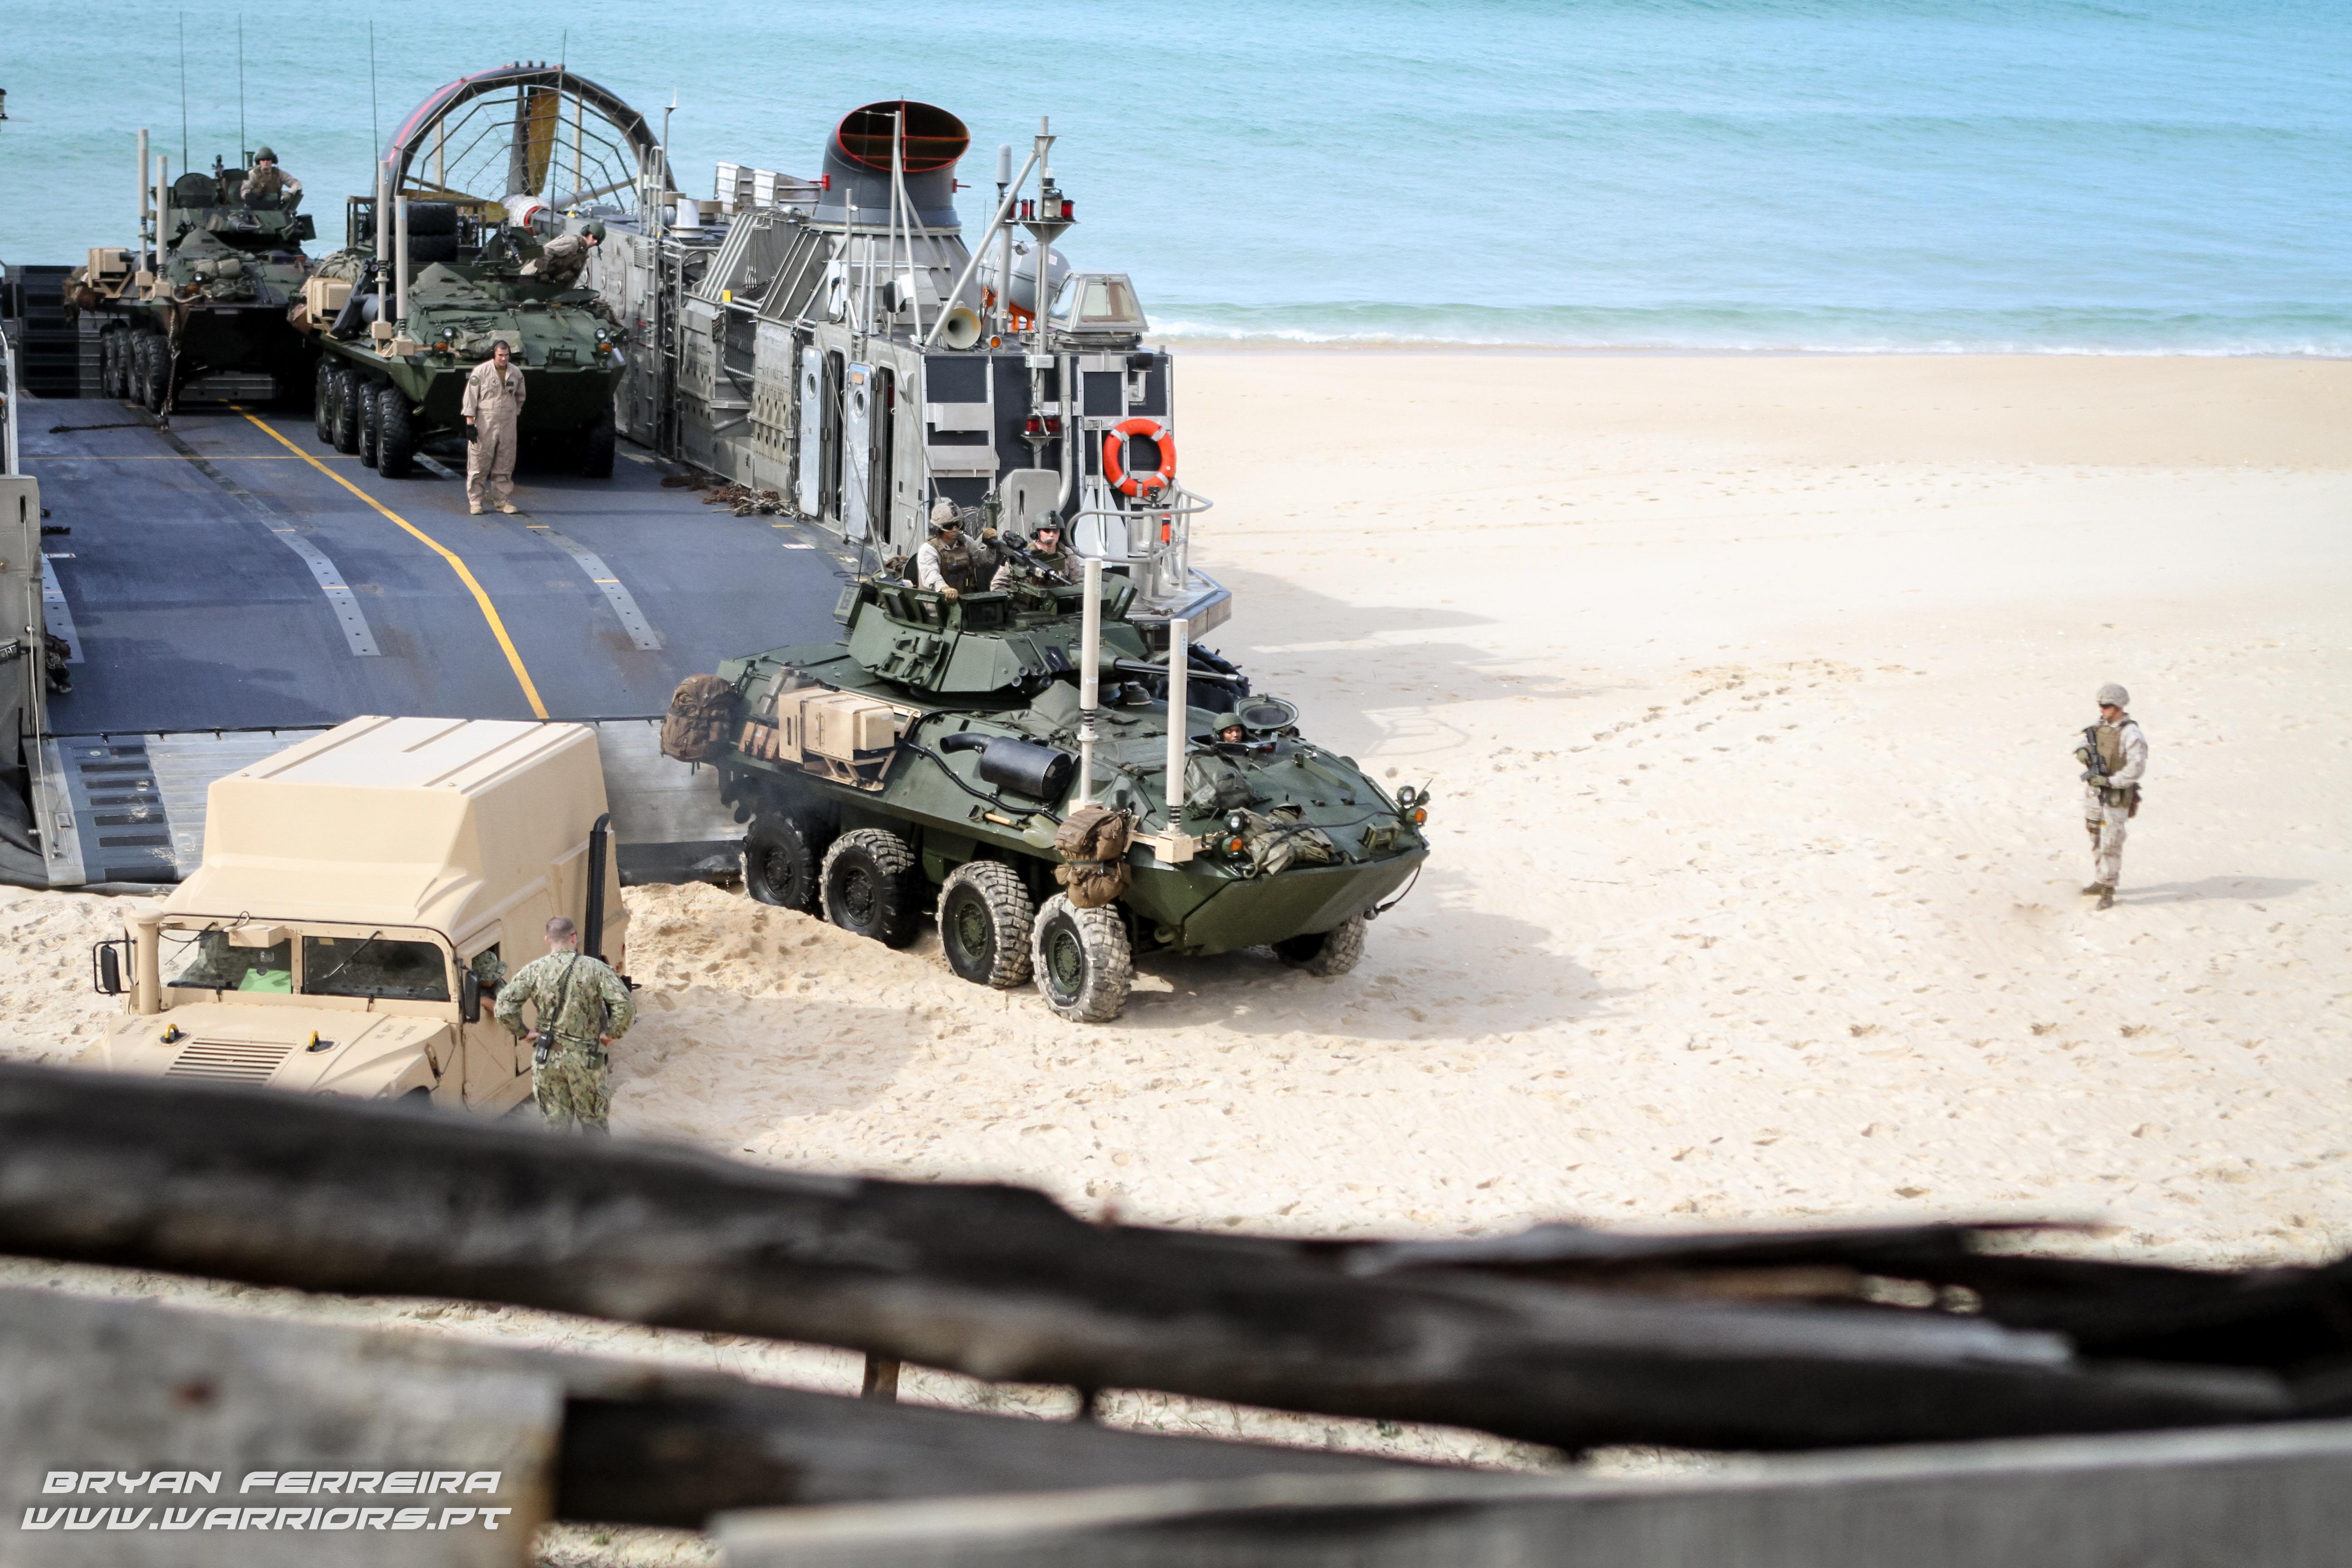 LCAC desembarca HMMWV e LAV25 dos US MArines na praia